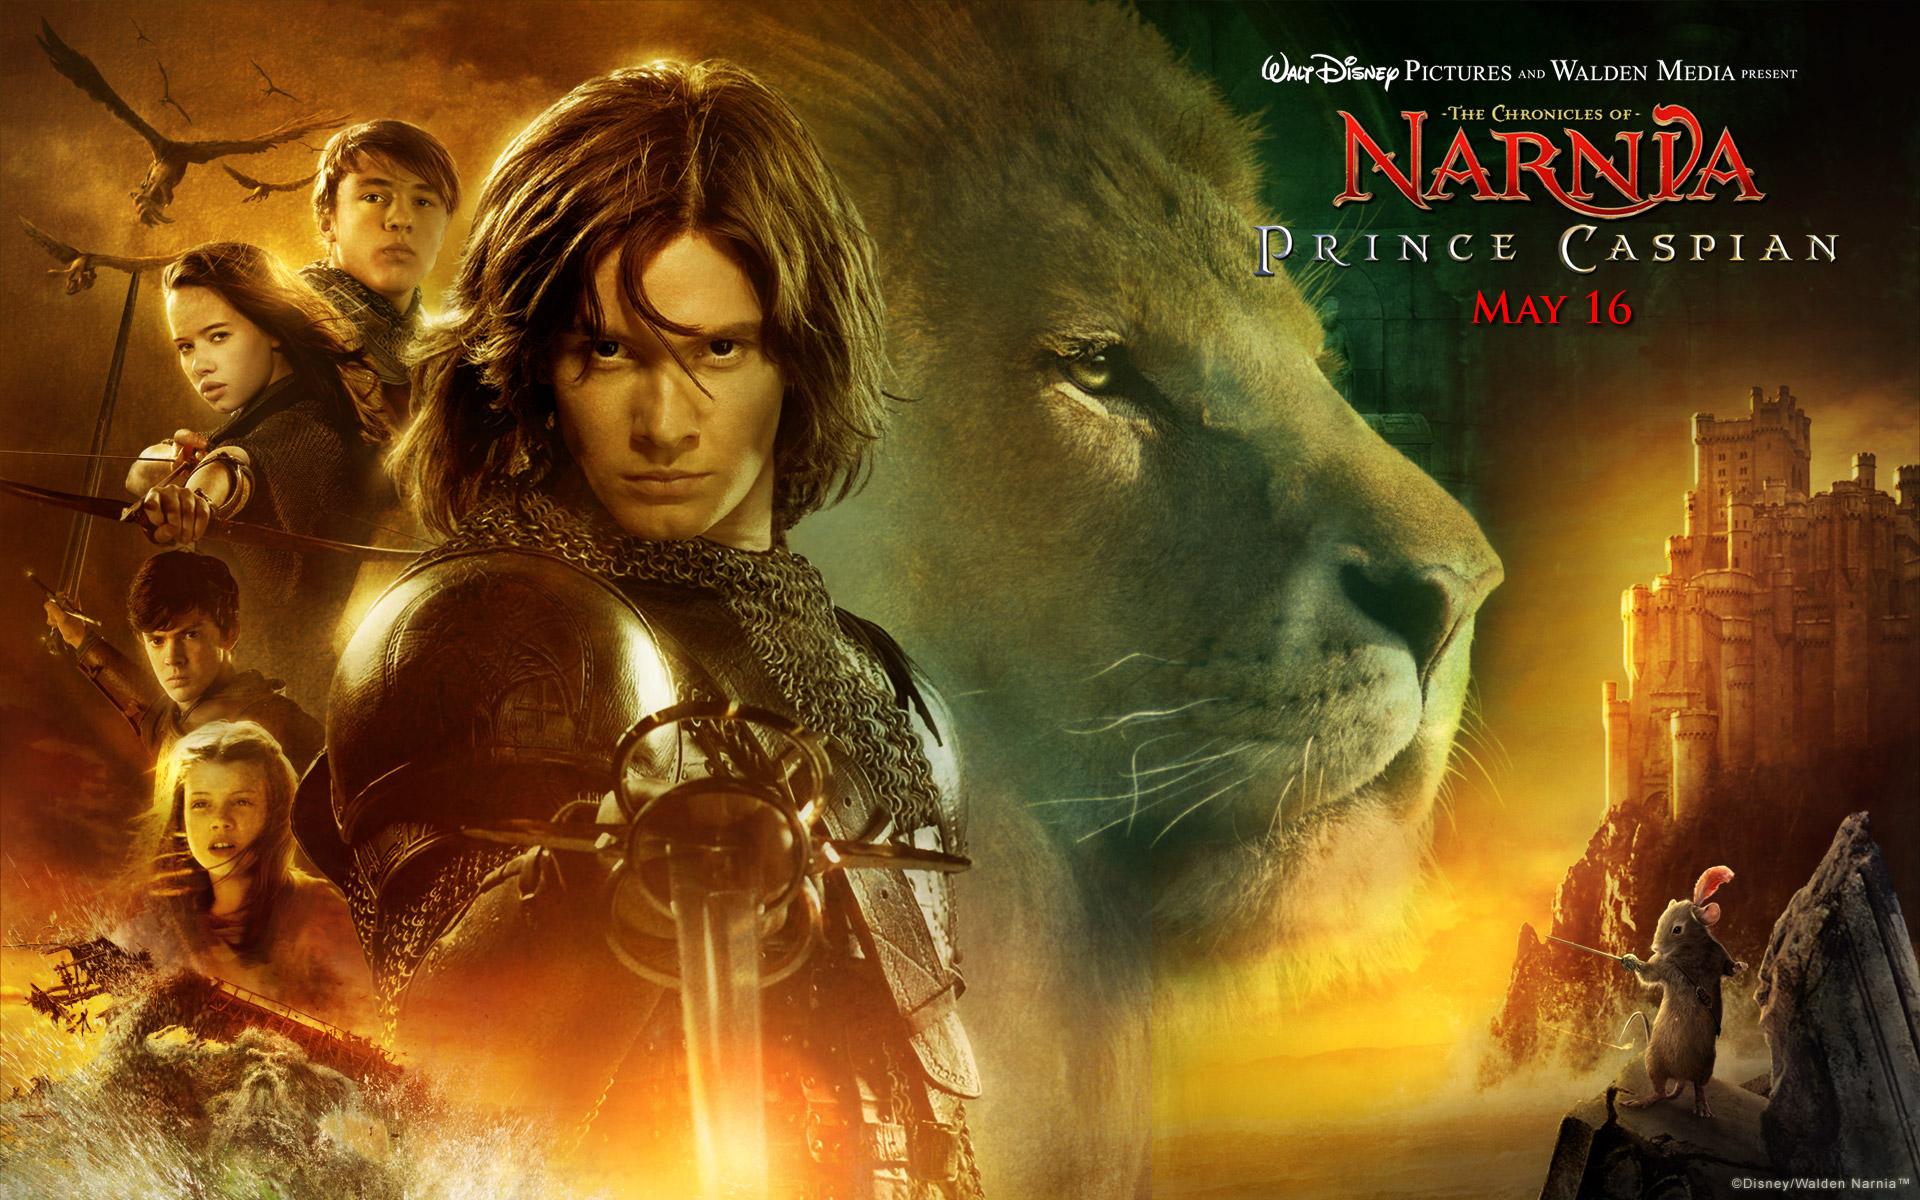 Amazing Pics Narnia HD Widescreen 24 Wallpapers 1920x1200